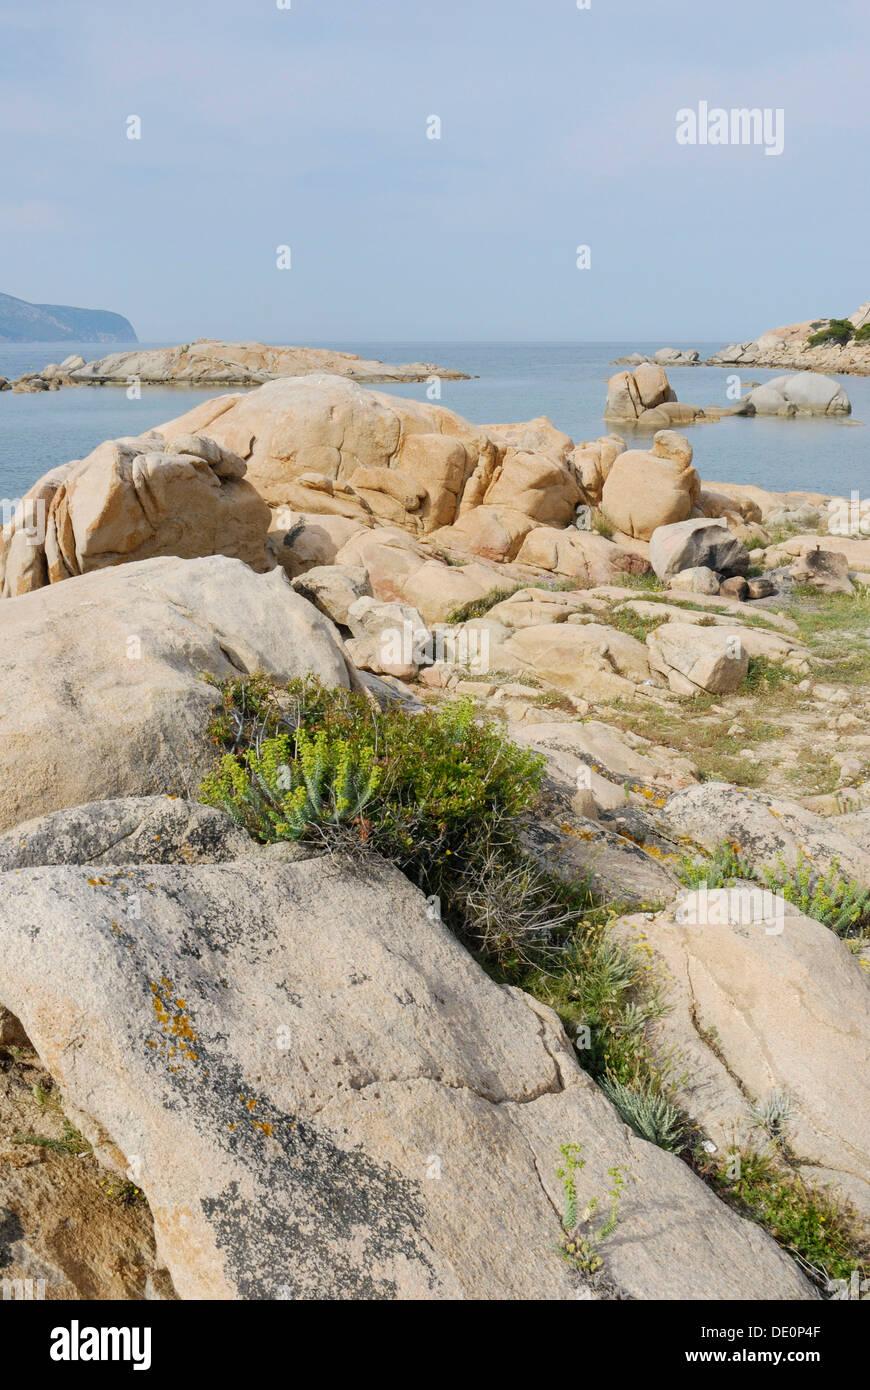 Mediterranean vegetation growing in granite rock crevices at the coast near Olbia, Sardinia, Italy, Europe Stock Photo